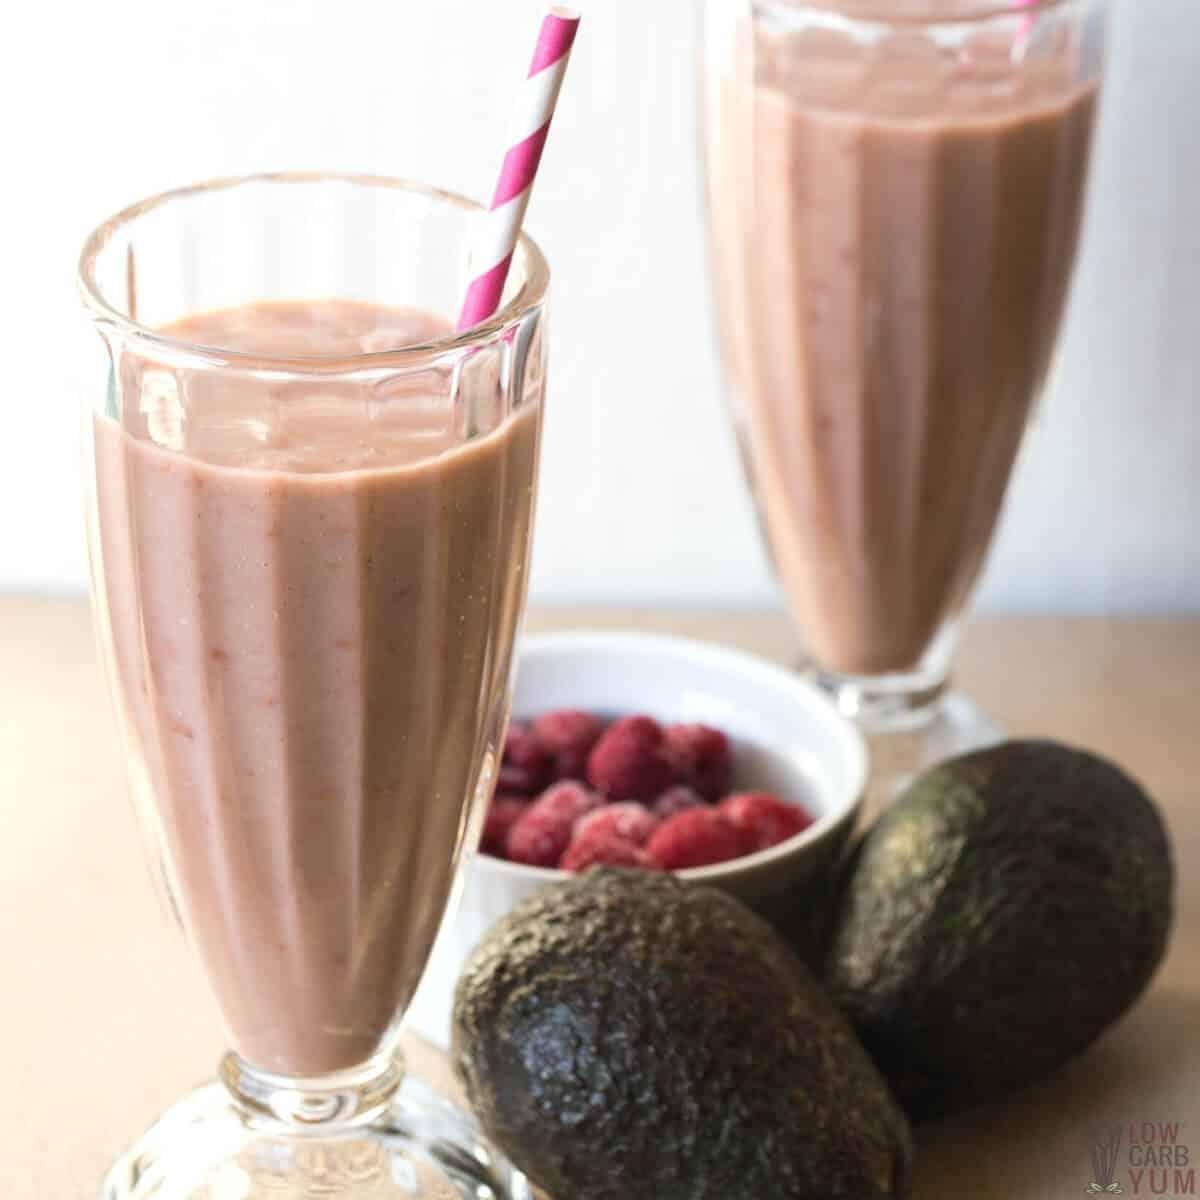 keto raspberry avocado smoothie recipe feature image